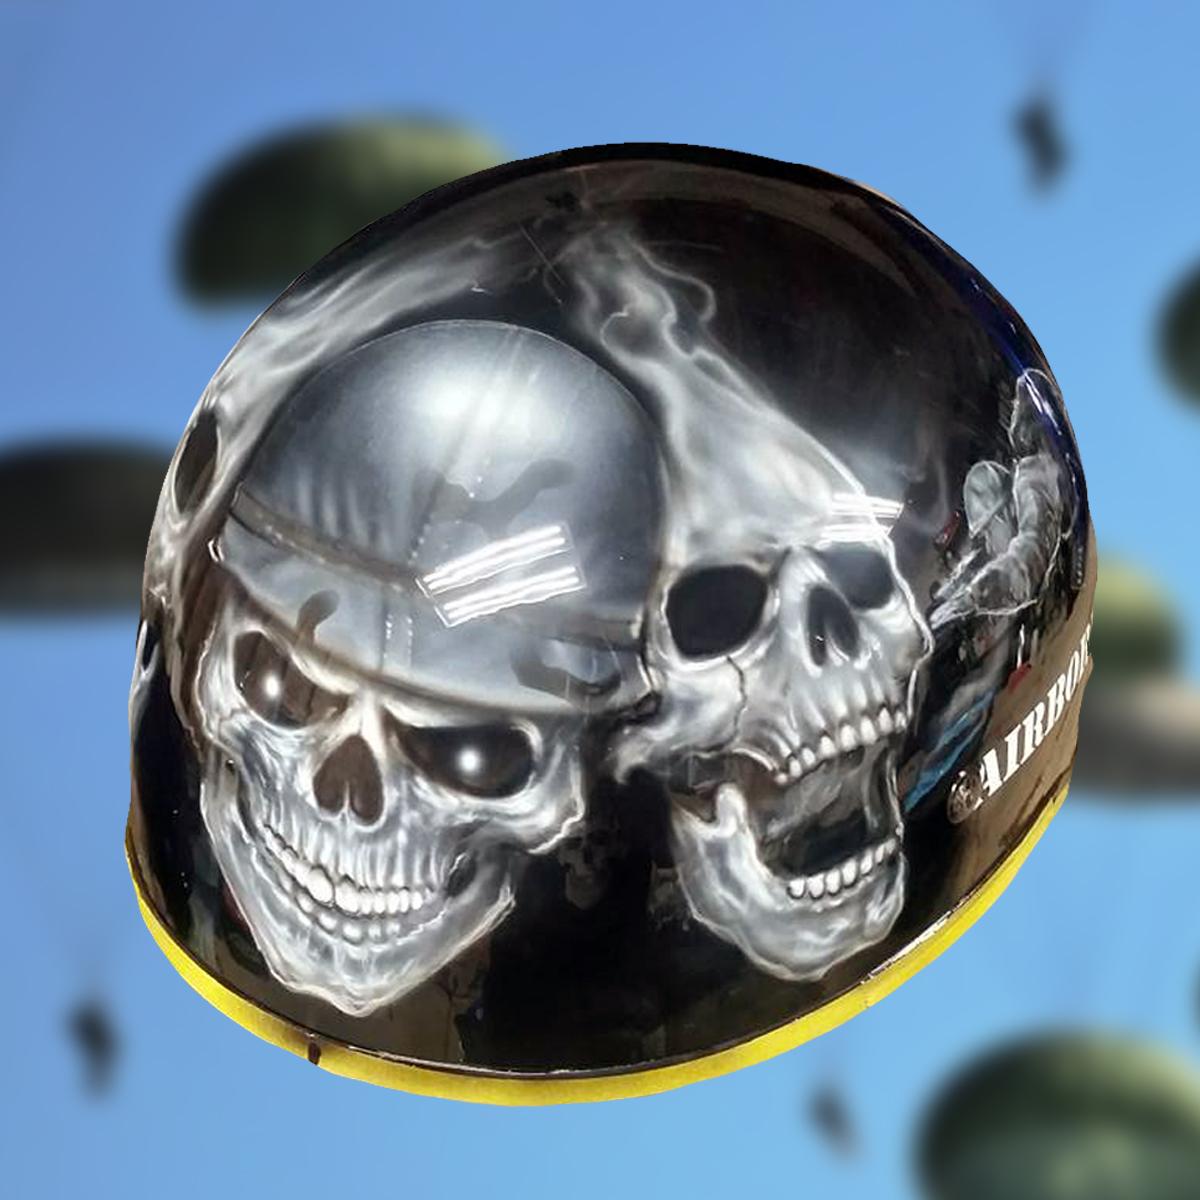 Airborne Helmet